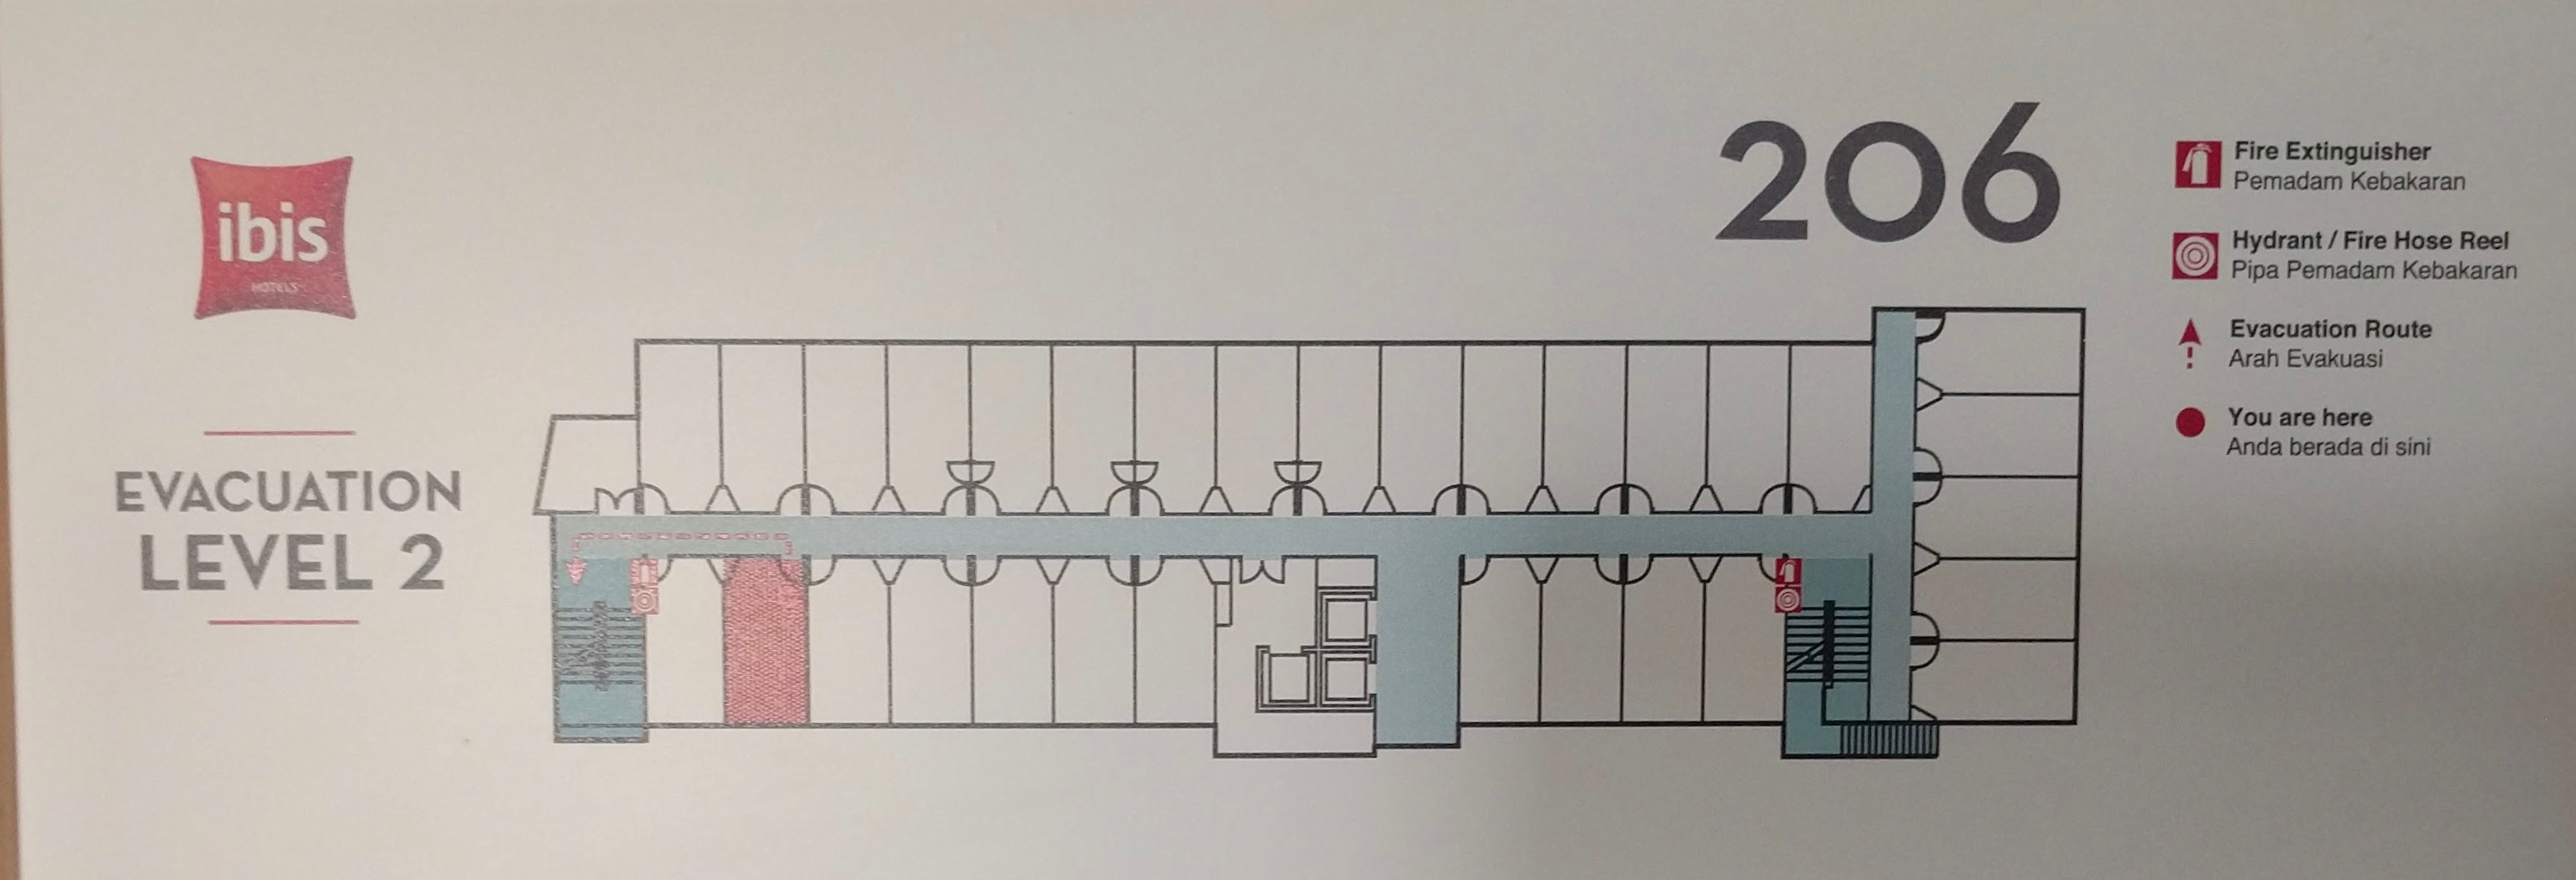 bal-ibis-legianstreet-floorplan